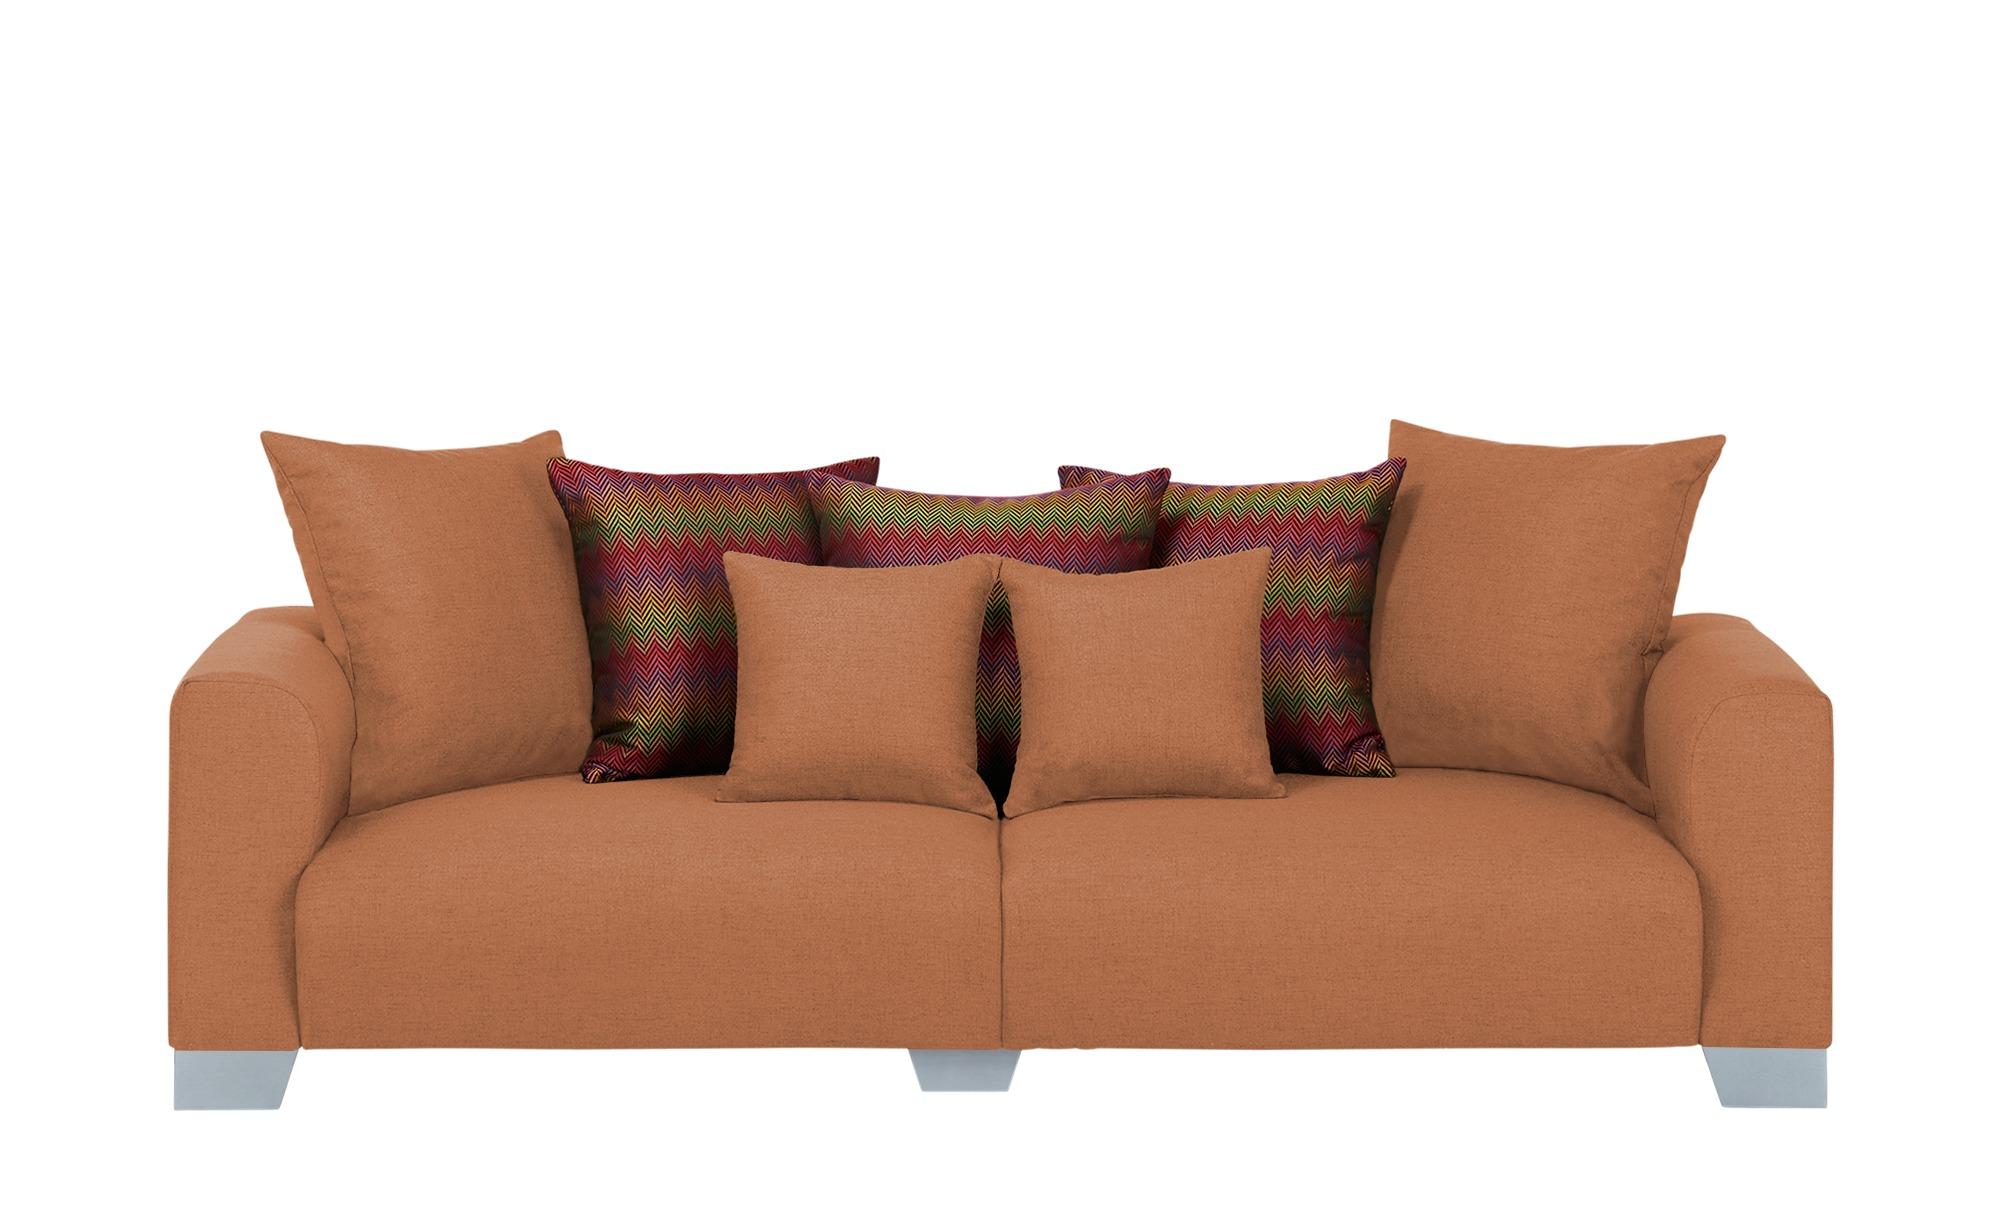 smart Big Sofa  Tonja ¦ orange ¦ Maße (cm): B: 244 H: 68 T: 107 Polstermöbel > Sofas > Big-Sofas - Höffner